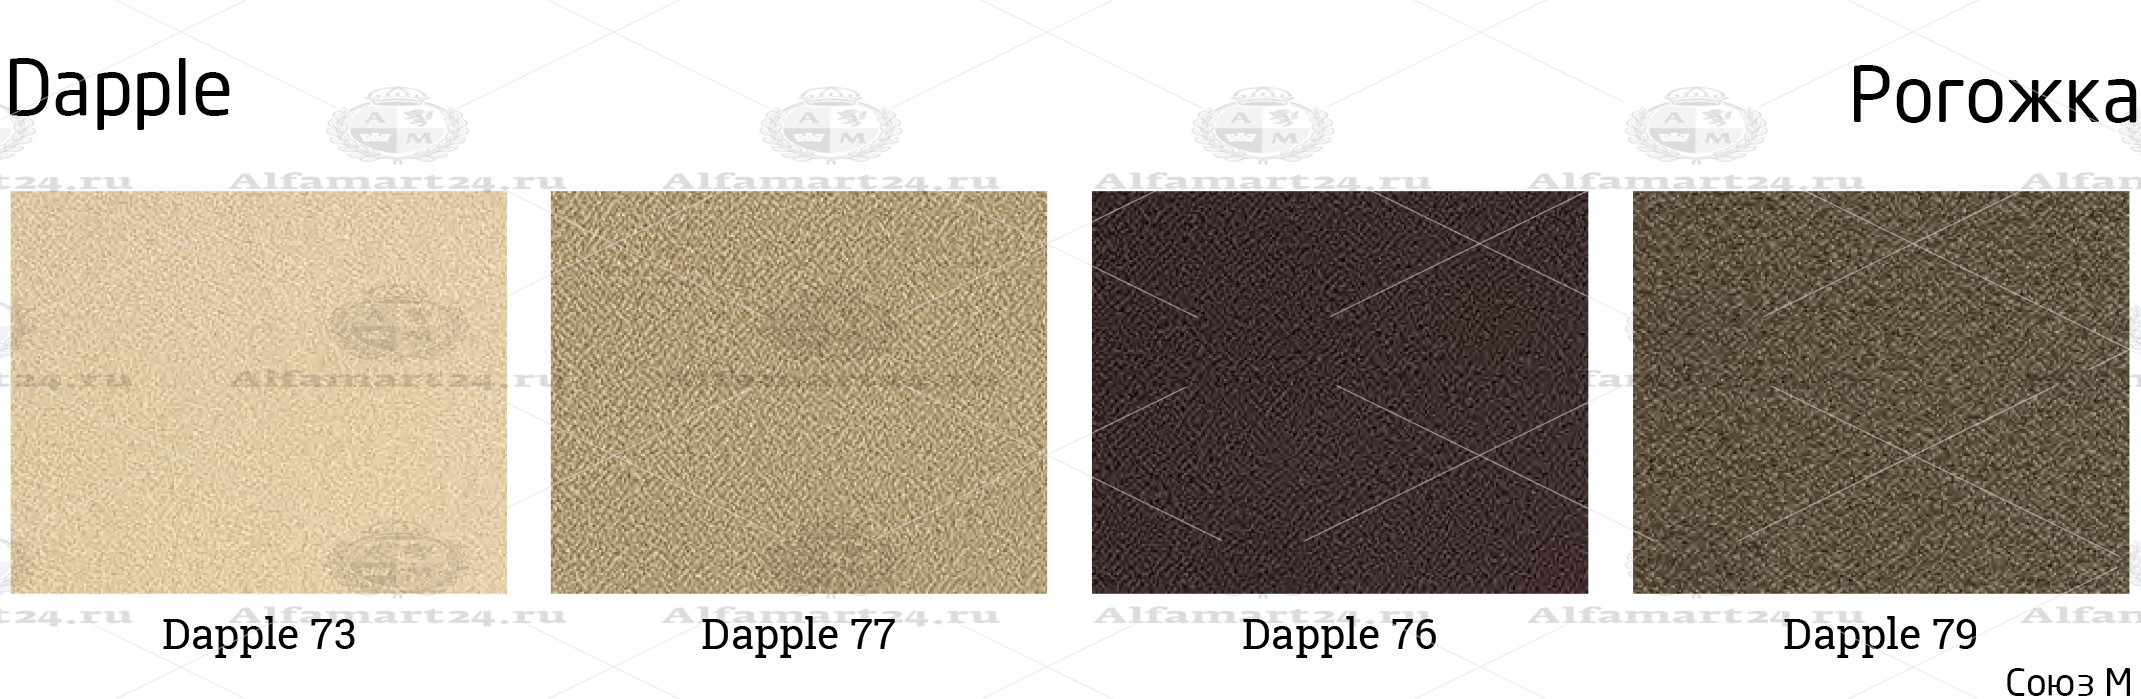 Dapple (рогожка) Союз М